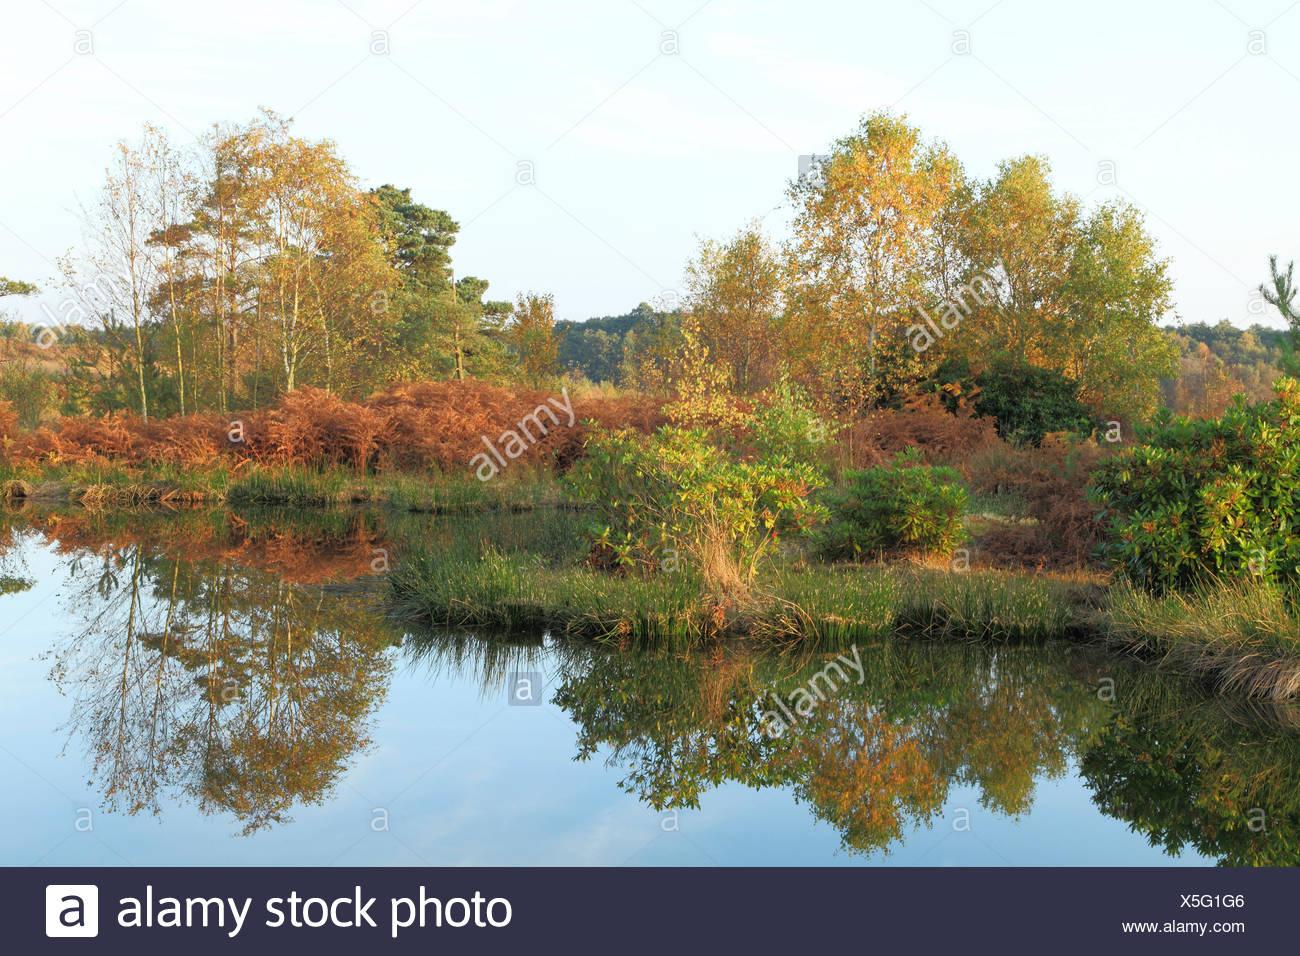 Dersingham Bog National Nature Reserve, designated a Site of Special Scientific Interest, mire, heath and woodland, SSI, Autumn, - Stock Image